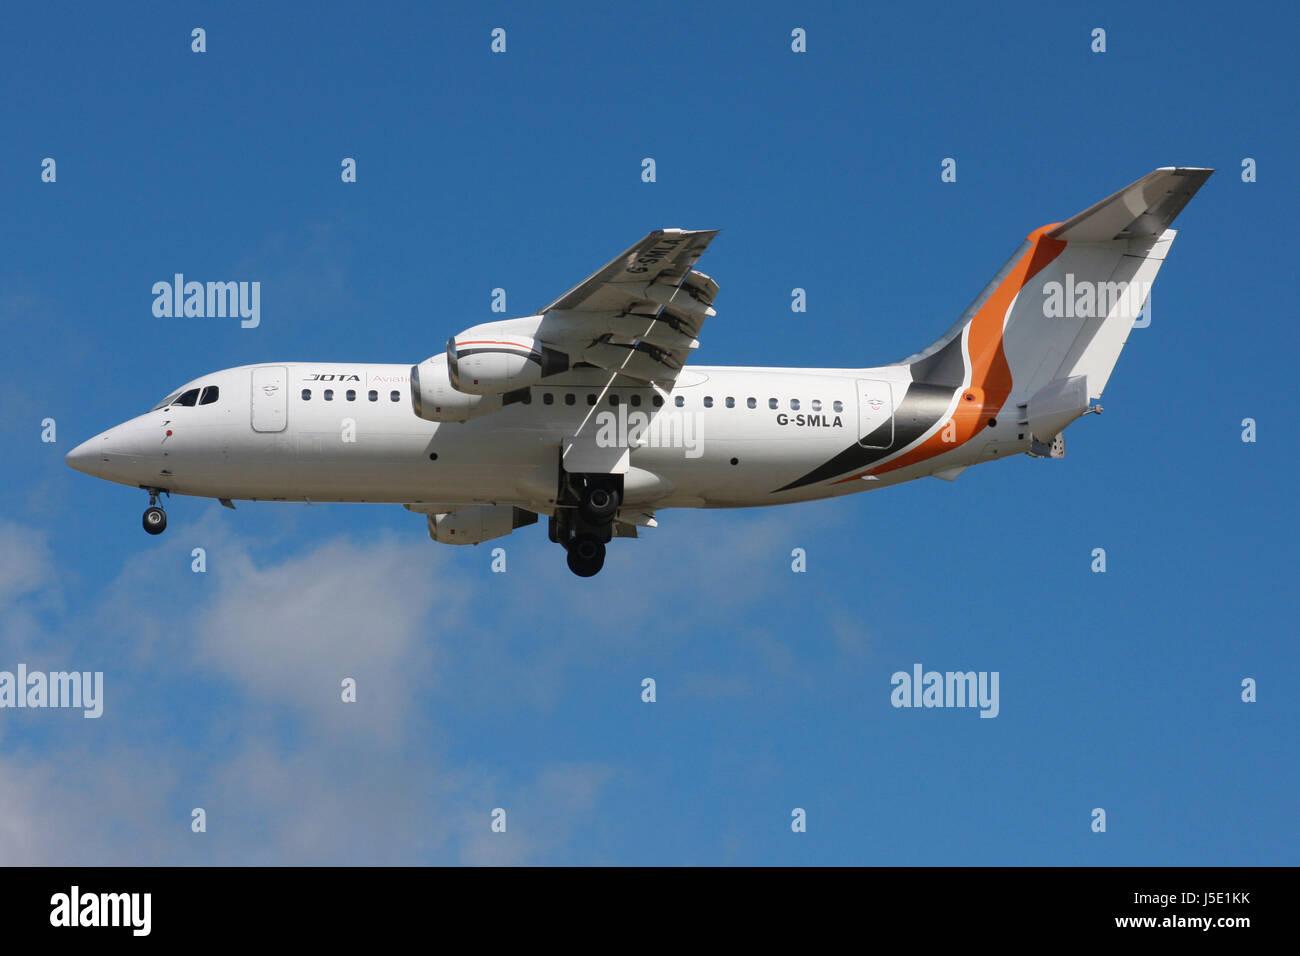 JOTA BAE 146 - Stock Image